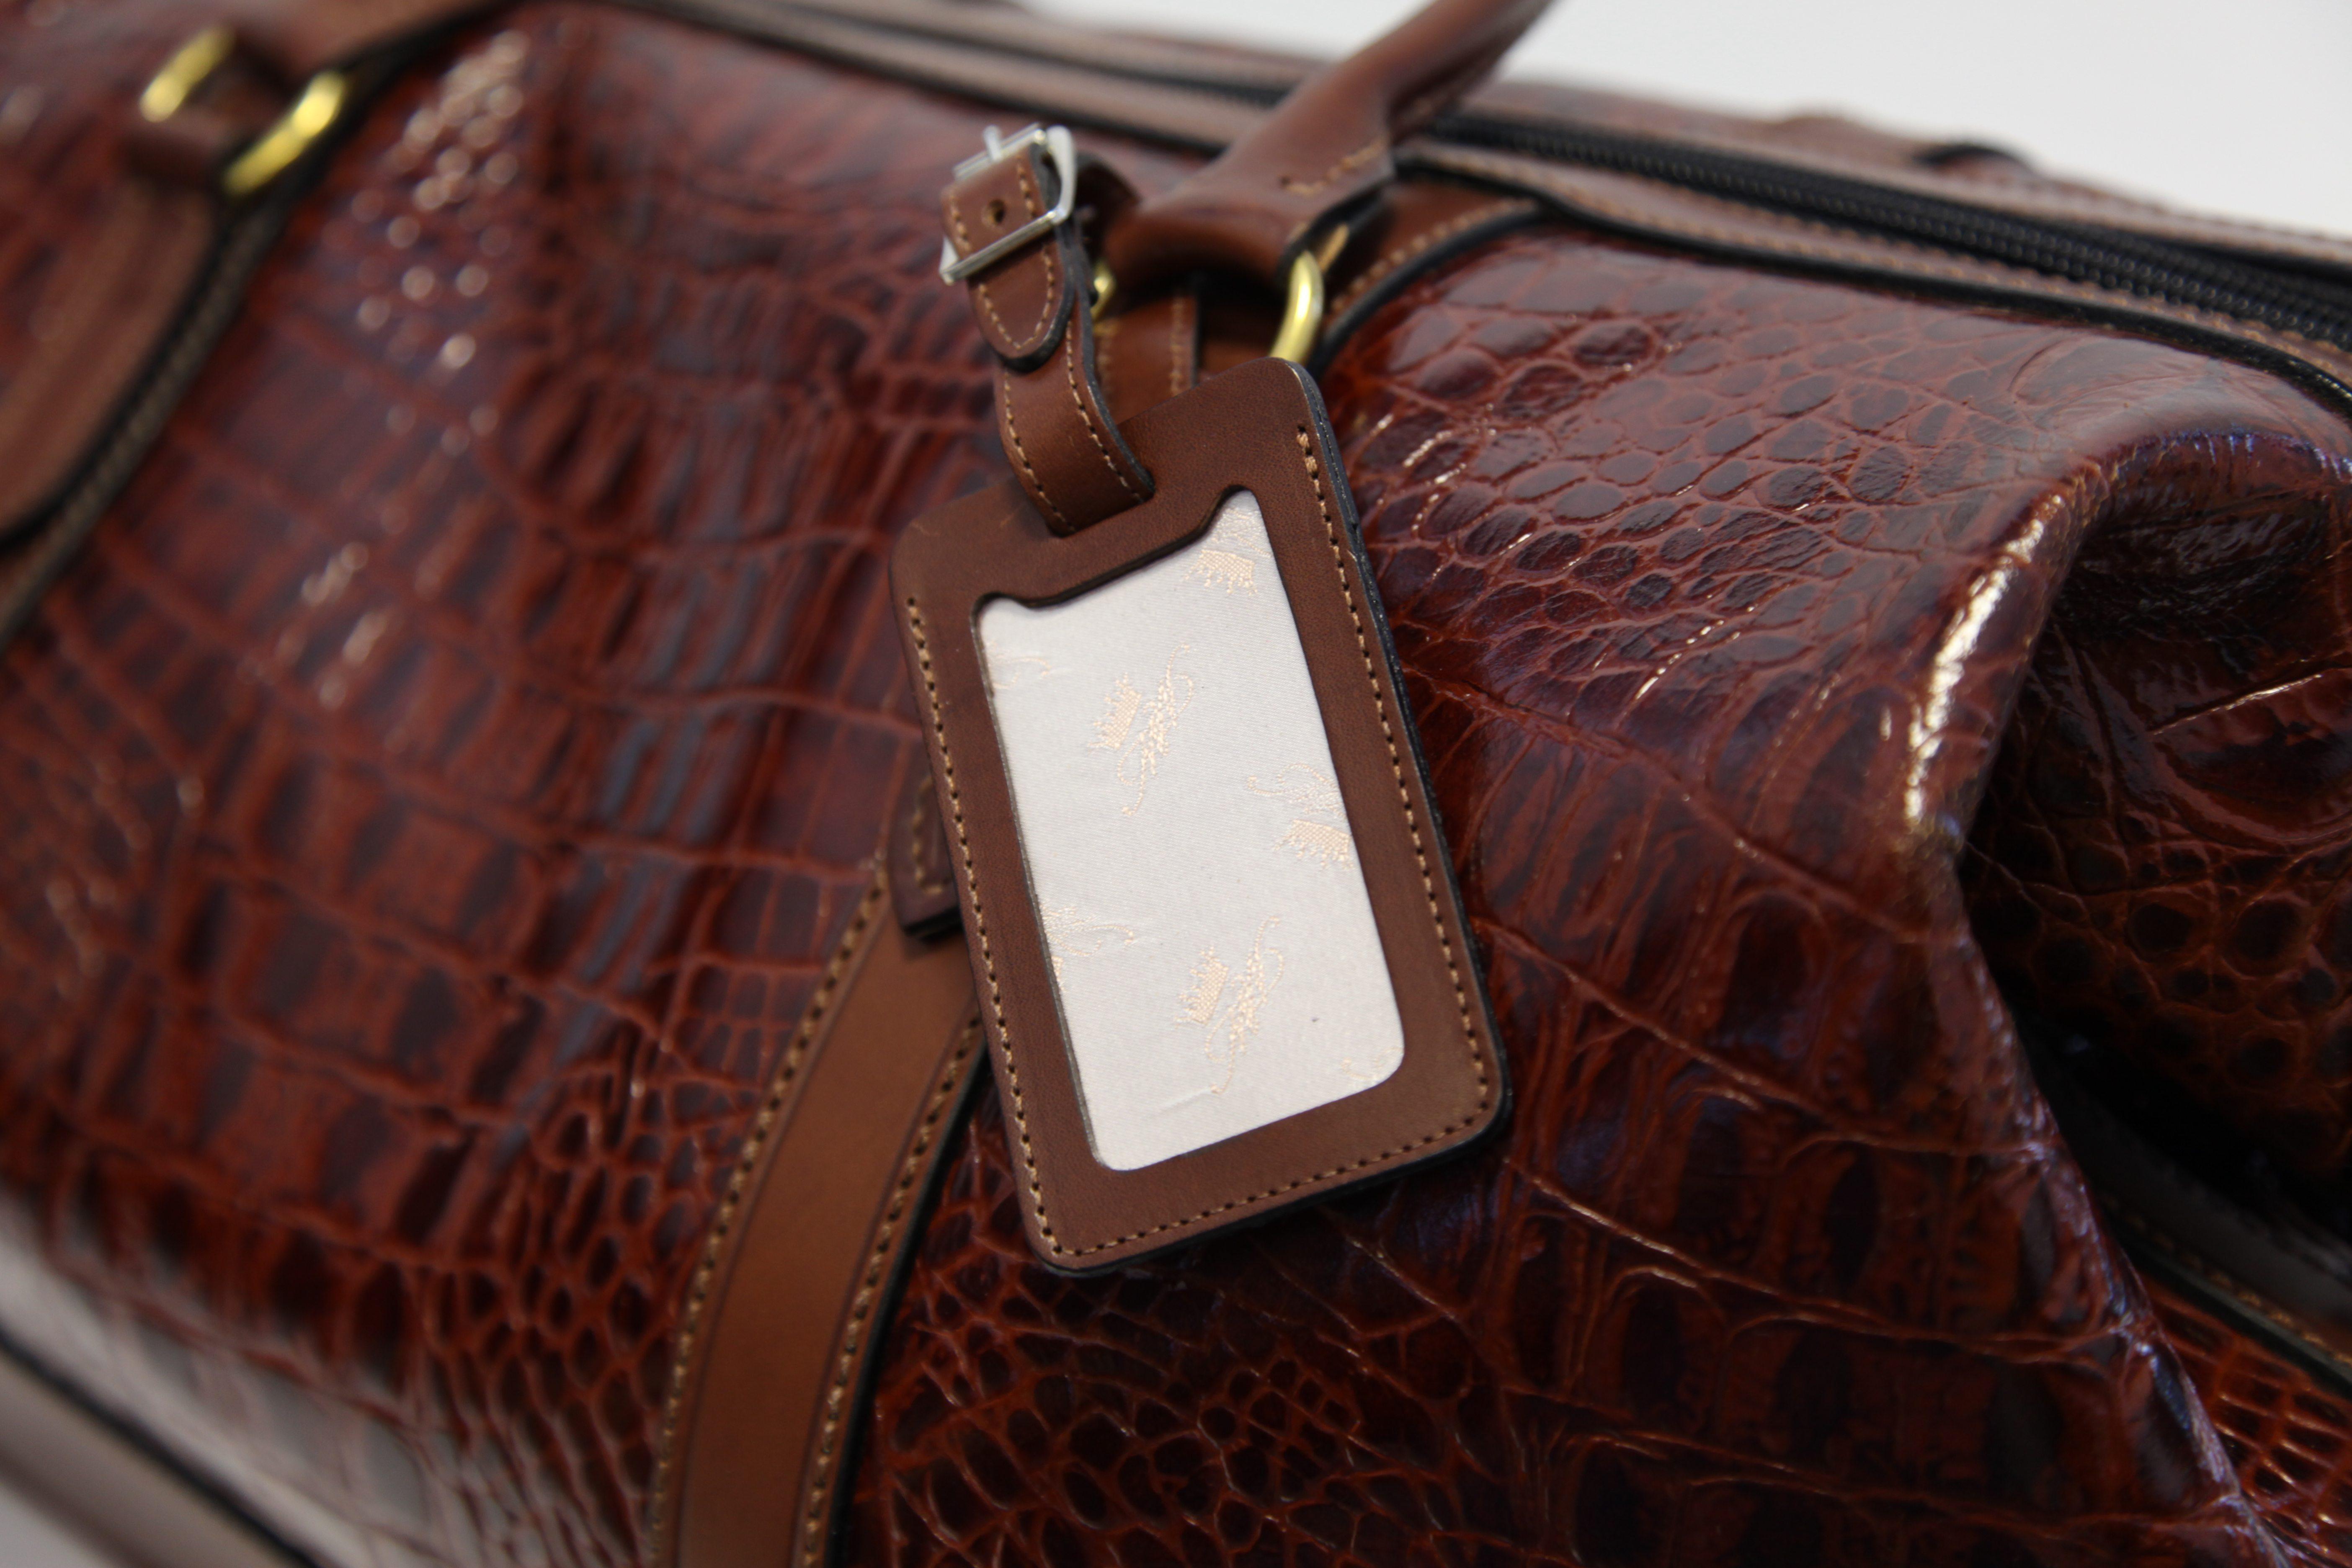 cfd45616b1 Weekend Bag Brown Leather Amazon Croc - Marlborough of England